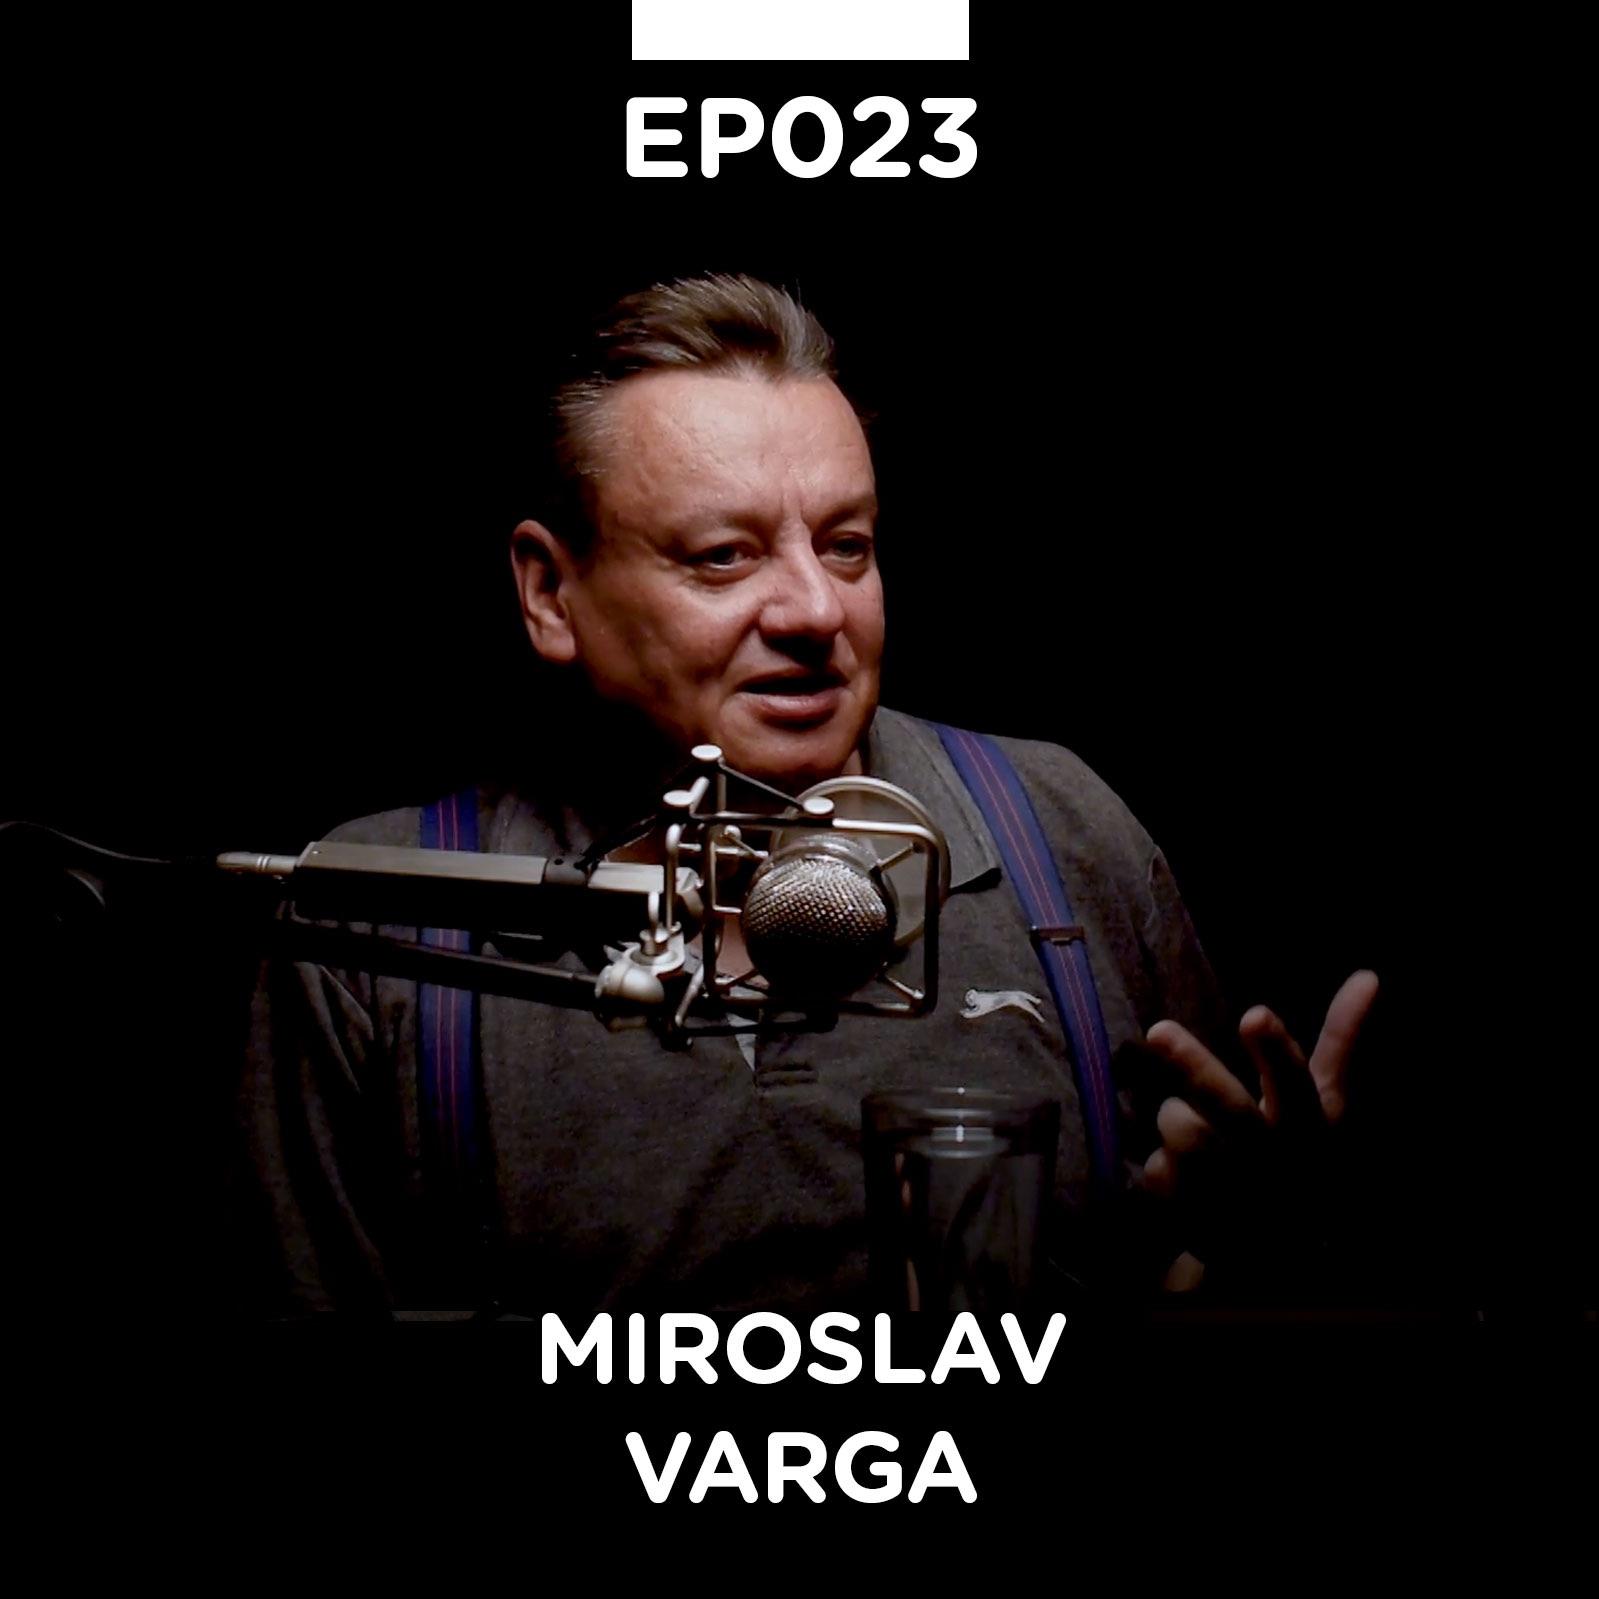 EP 023: Miroslav Varga - Pojačalo podcast